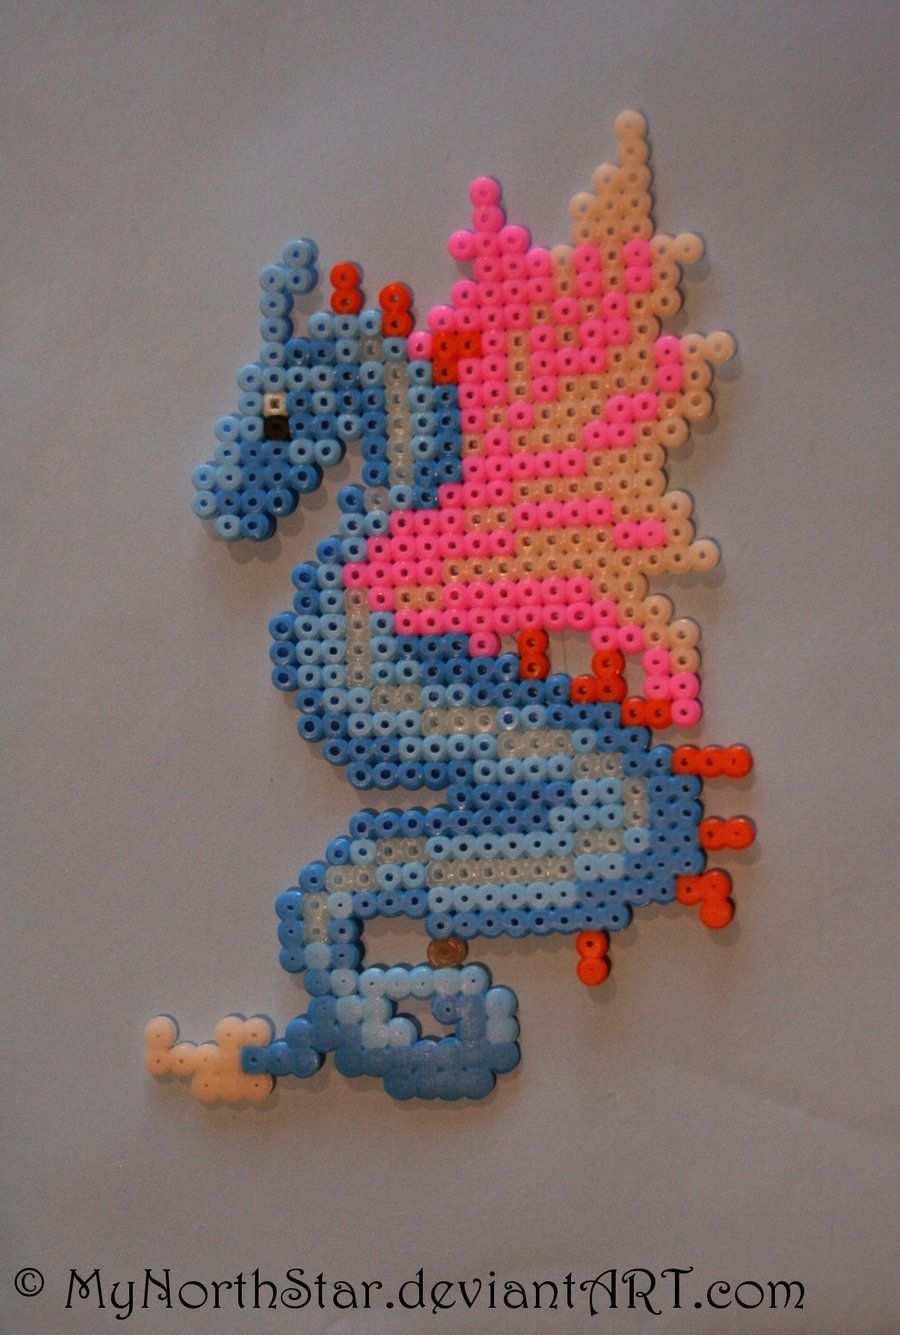 Little Dragon By Mynorthstar On Deviantart Perler Bead Art Perler Bead Templates Perler Beads